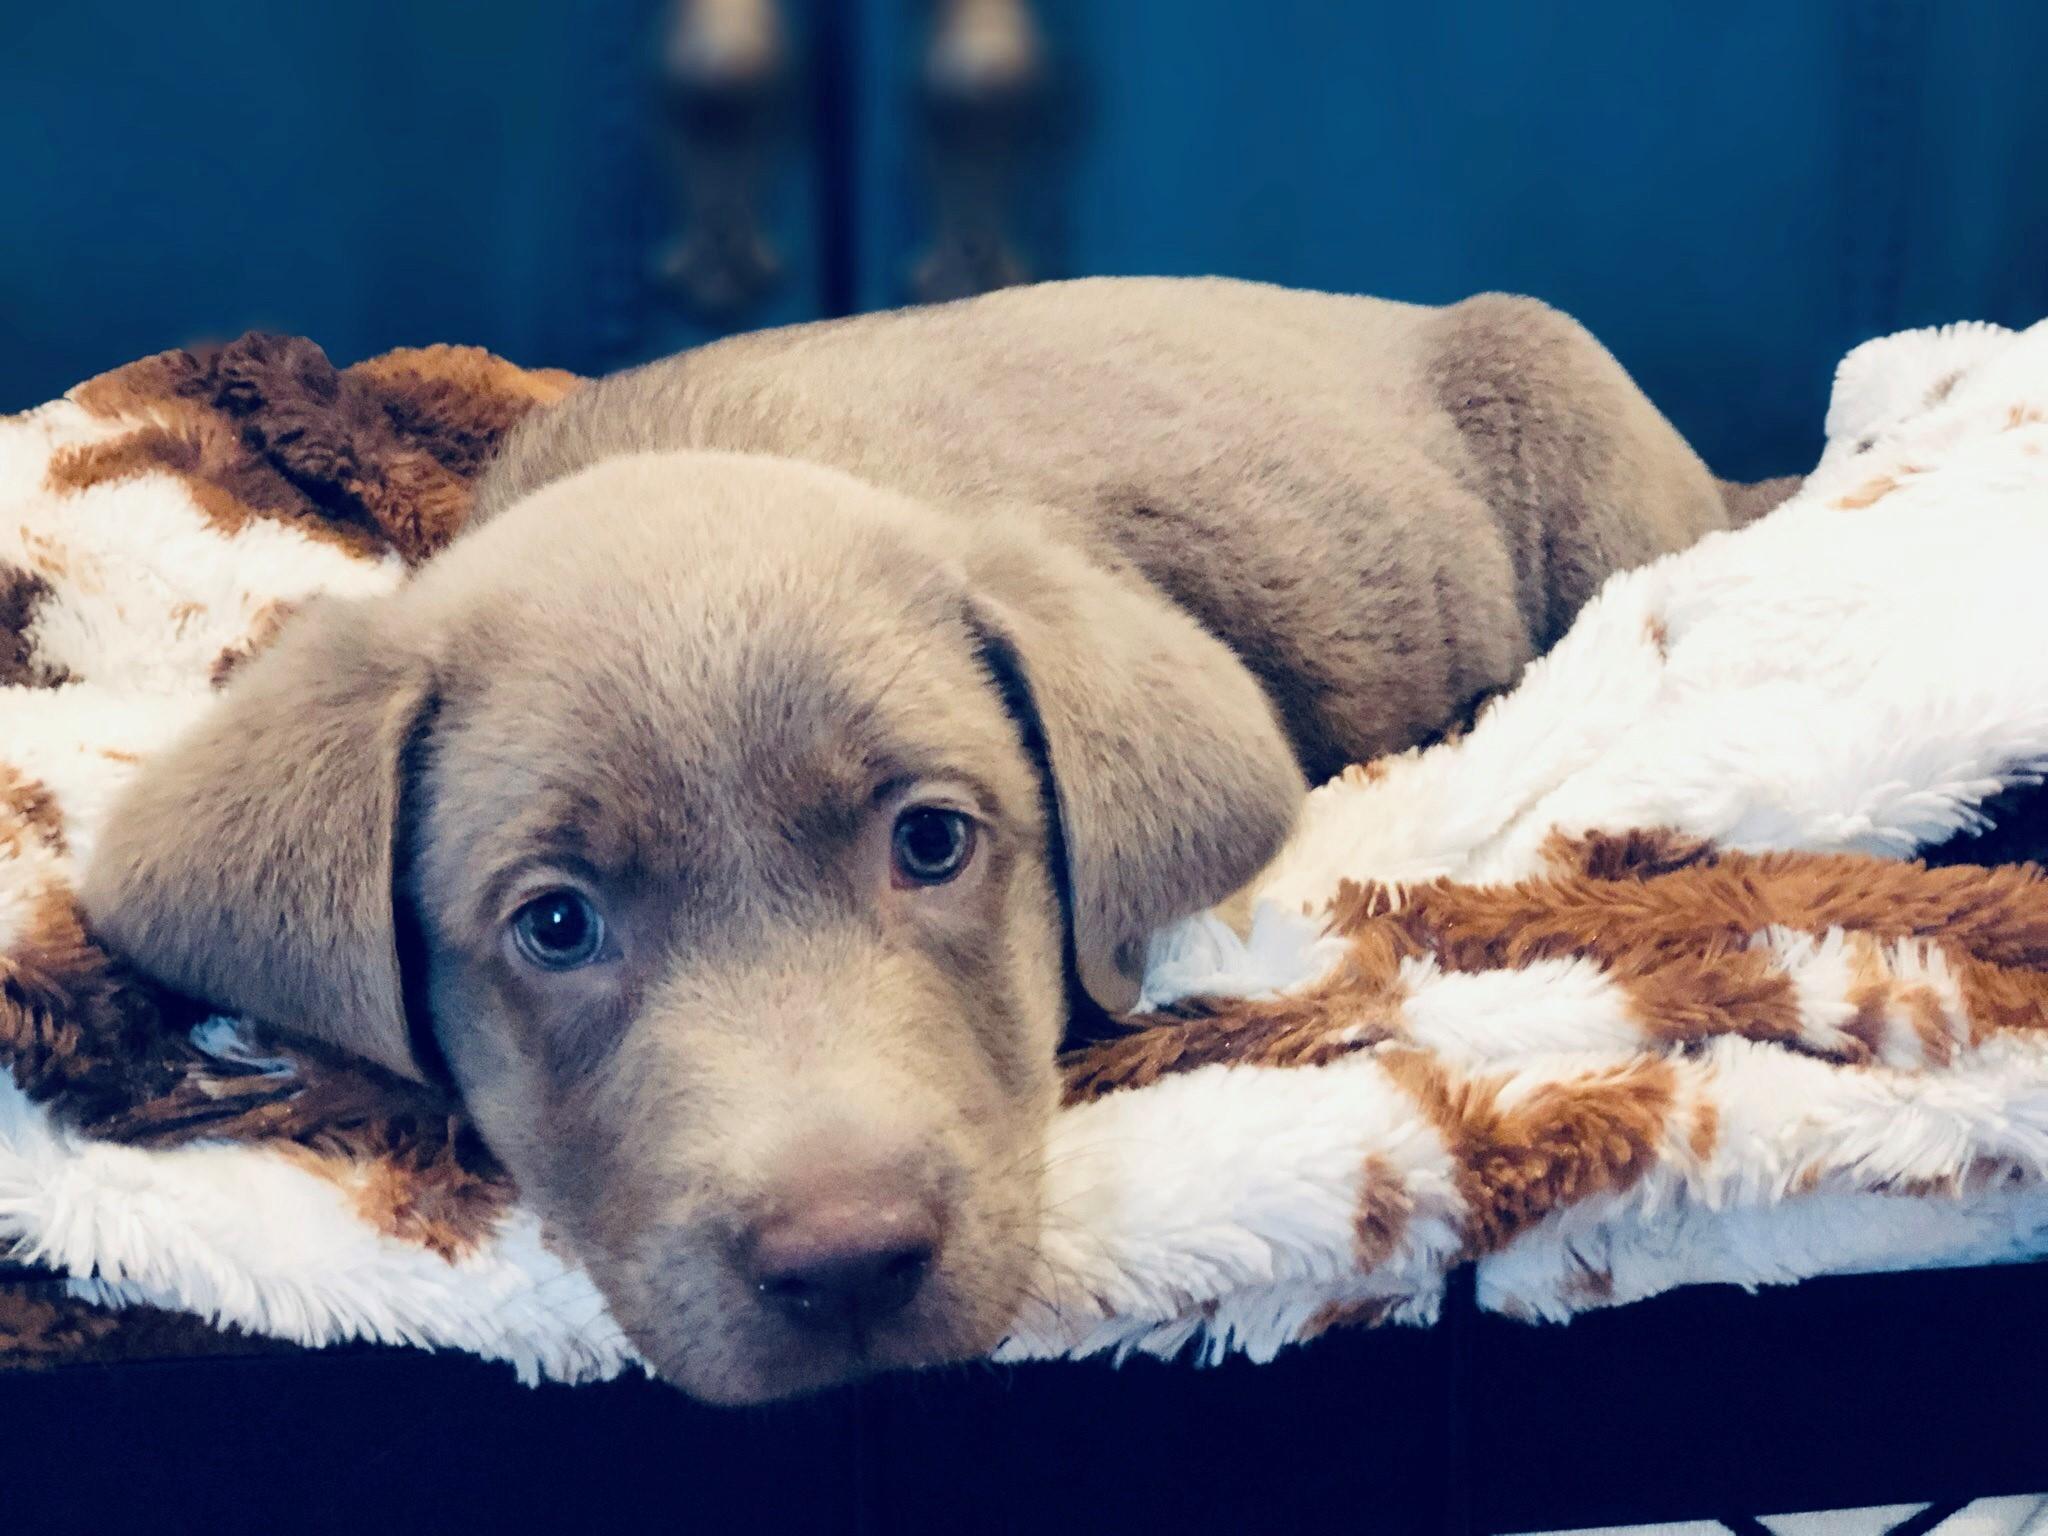 labrador-puppy-laying-down